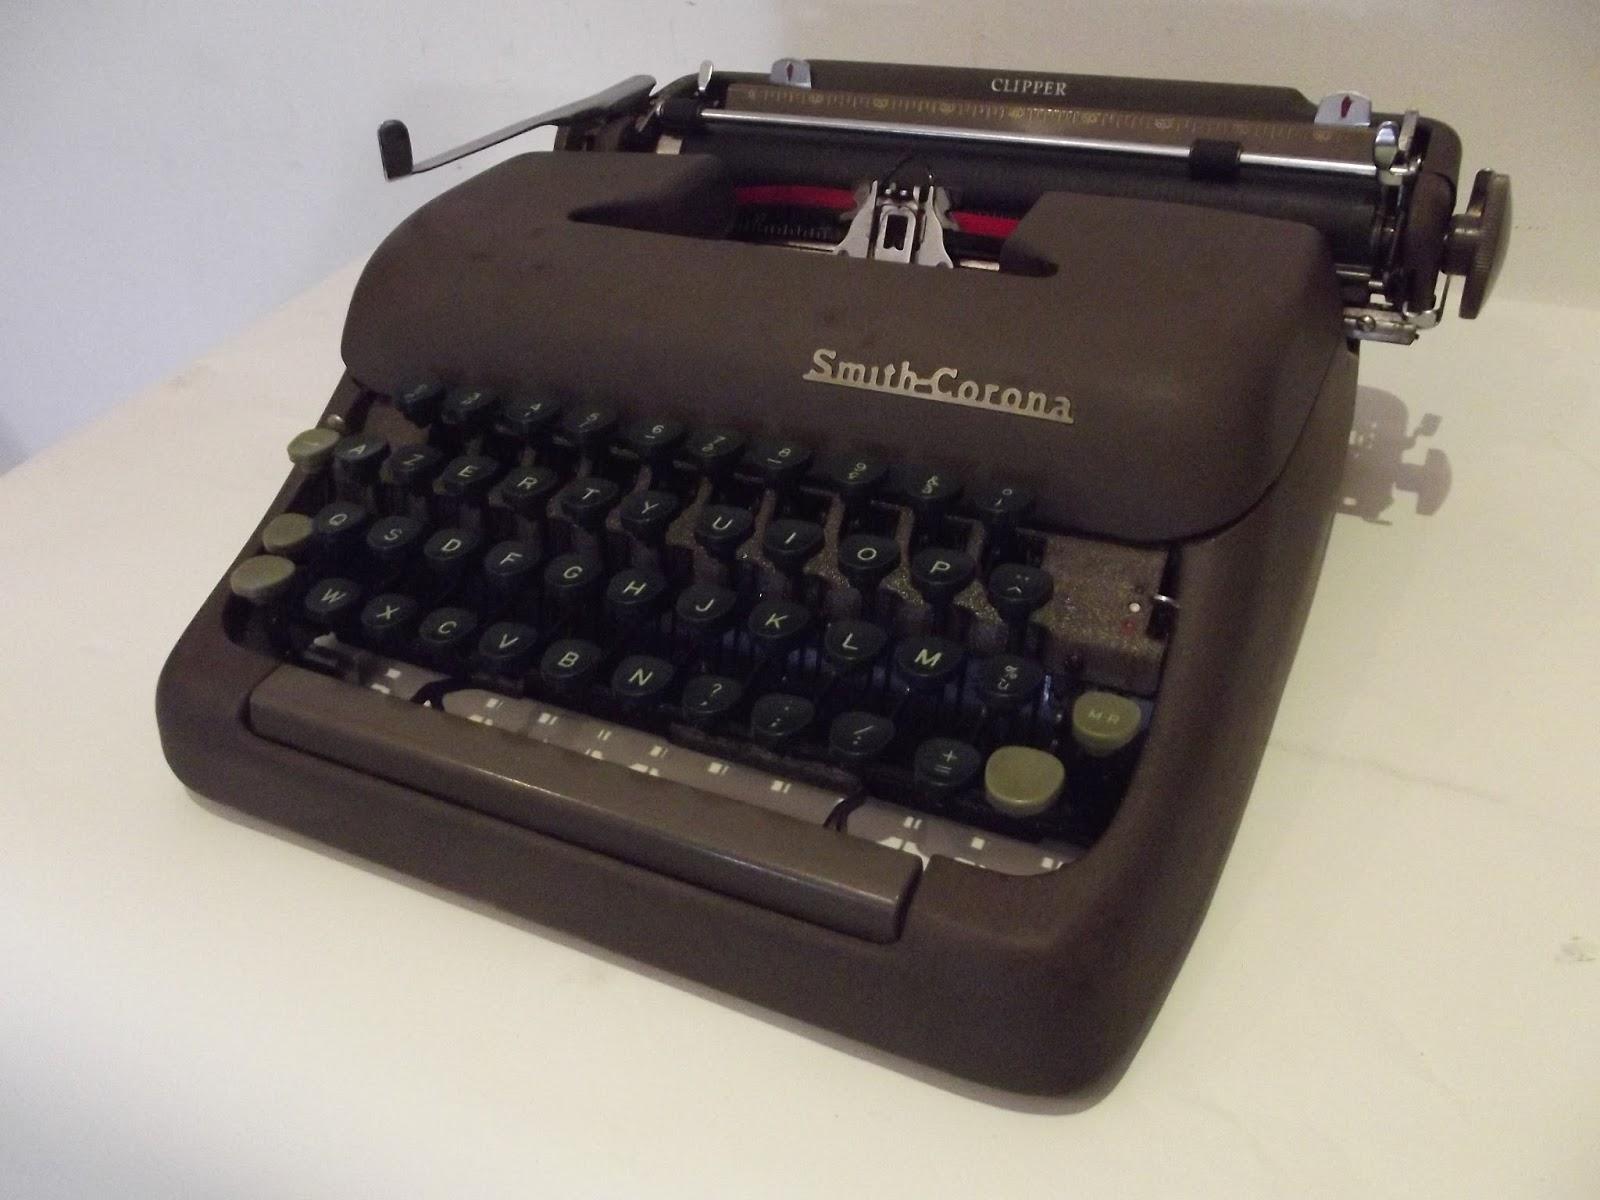 ancienne machine a ecrire l c smith corona corp clipper made in usa. Black Bedroom Furniture Sets. Home Design Ideas